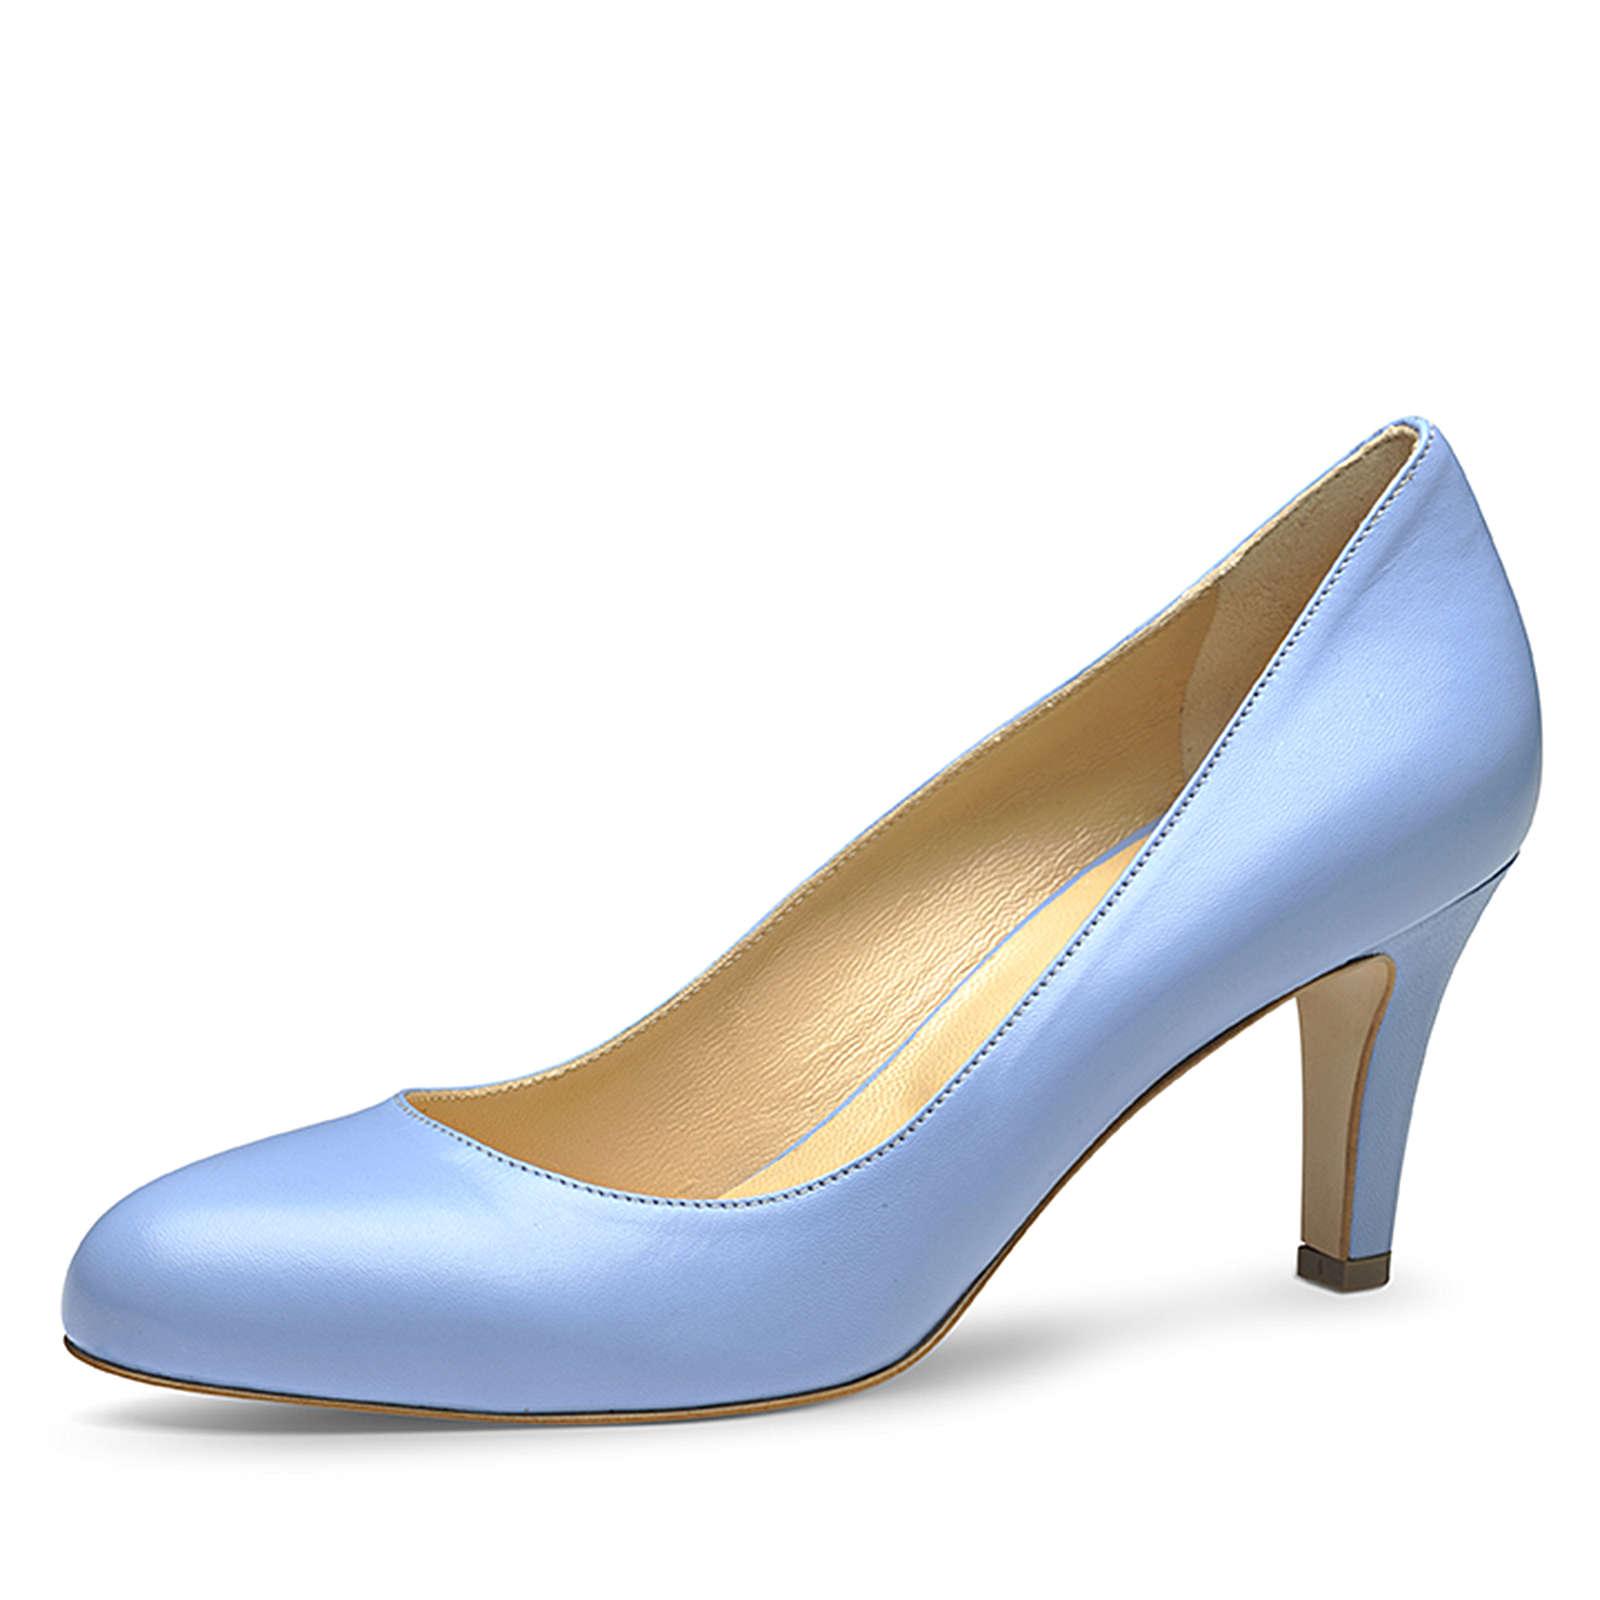 Evita Shoes Pumps hellblau Damen Gr. 34